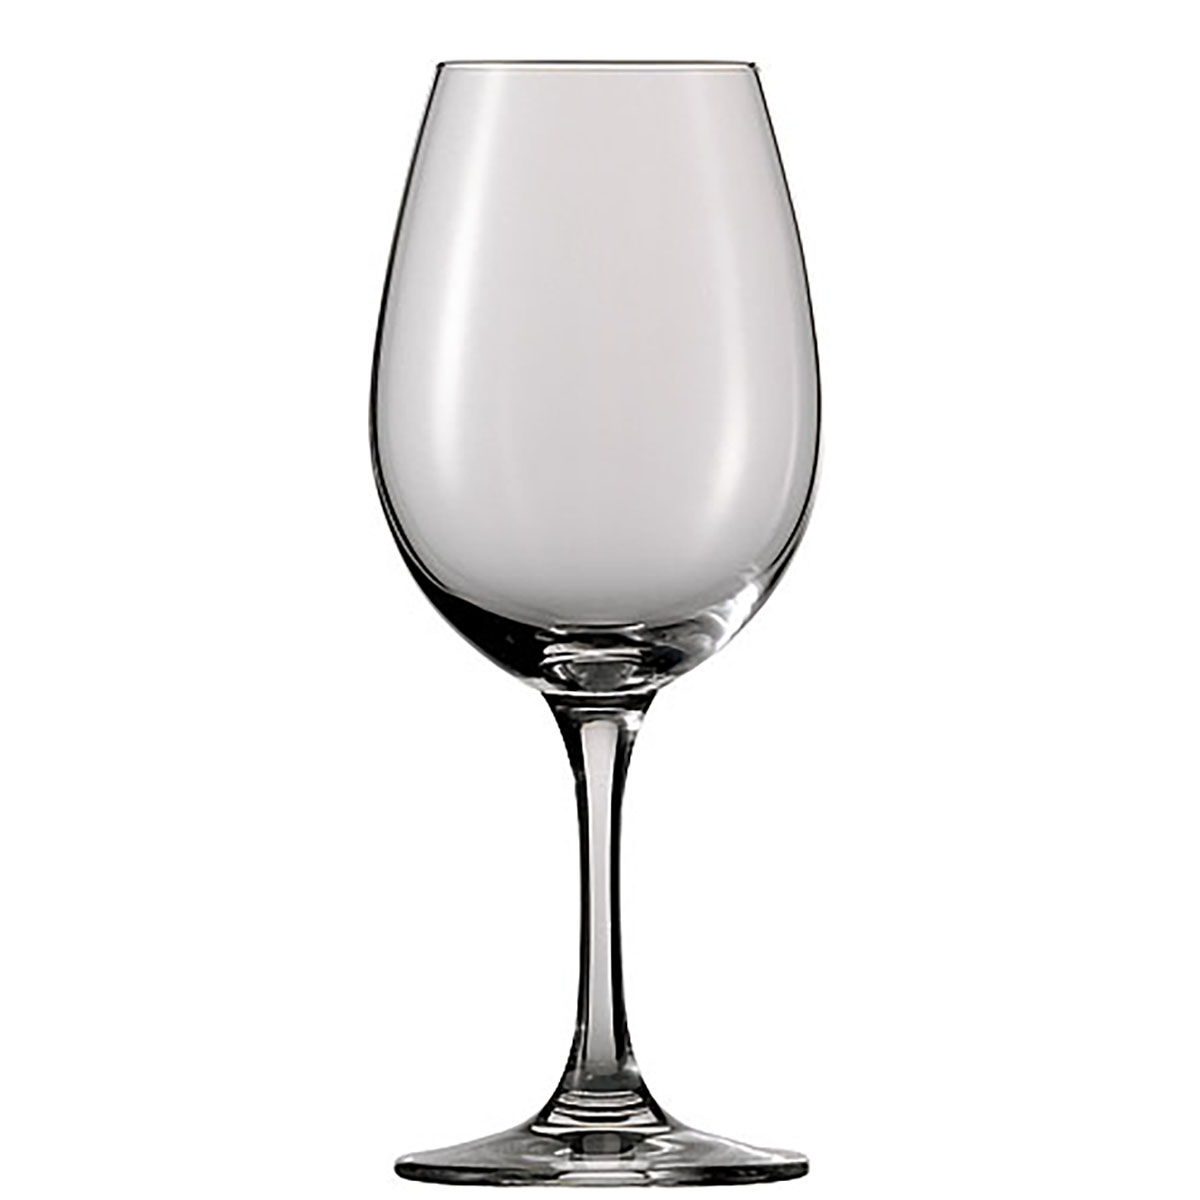 Schott Zwiesel Sensus Professional Wine Taster, Set of Six